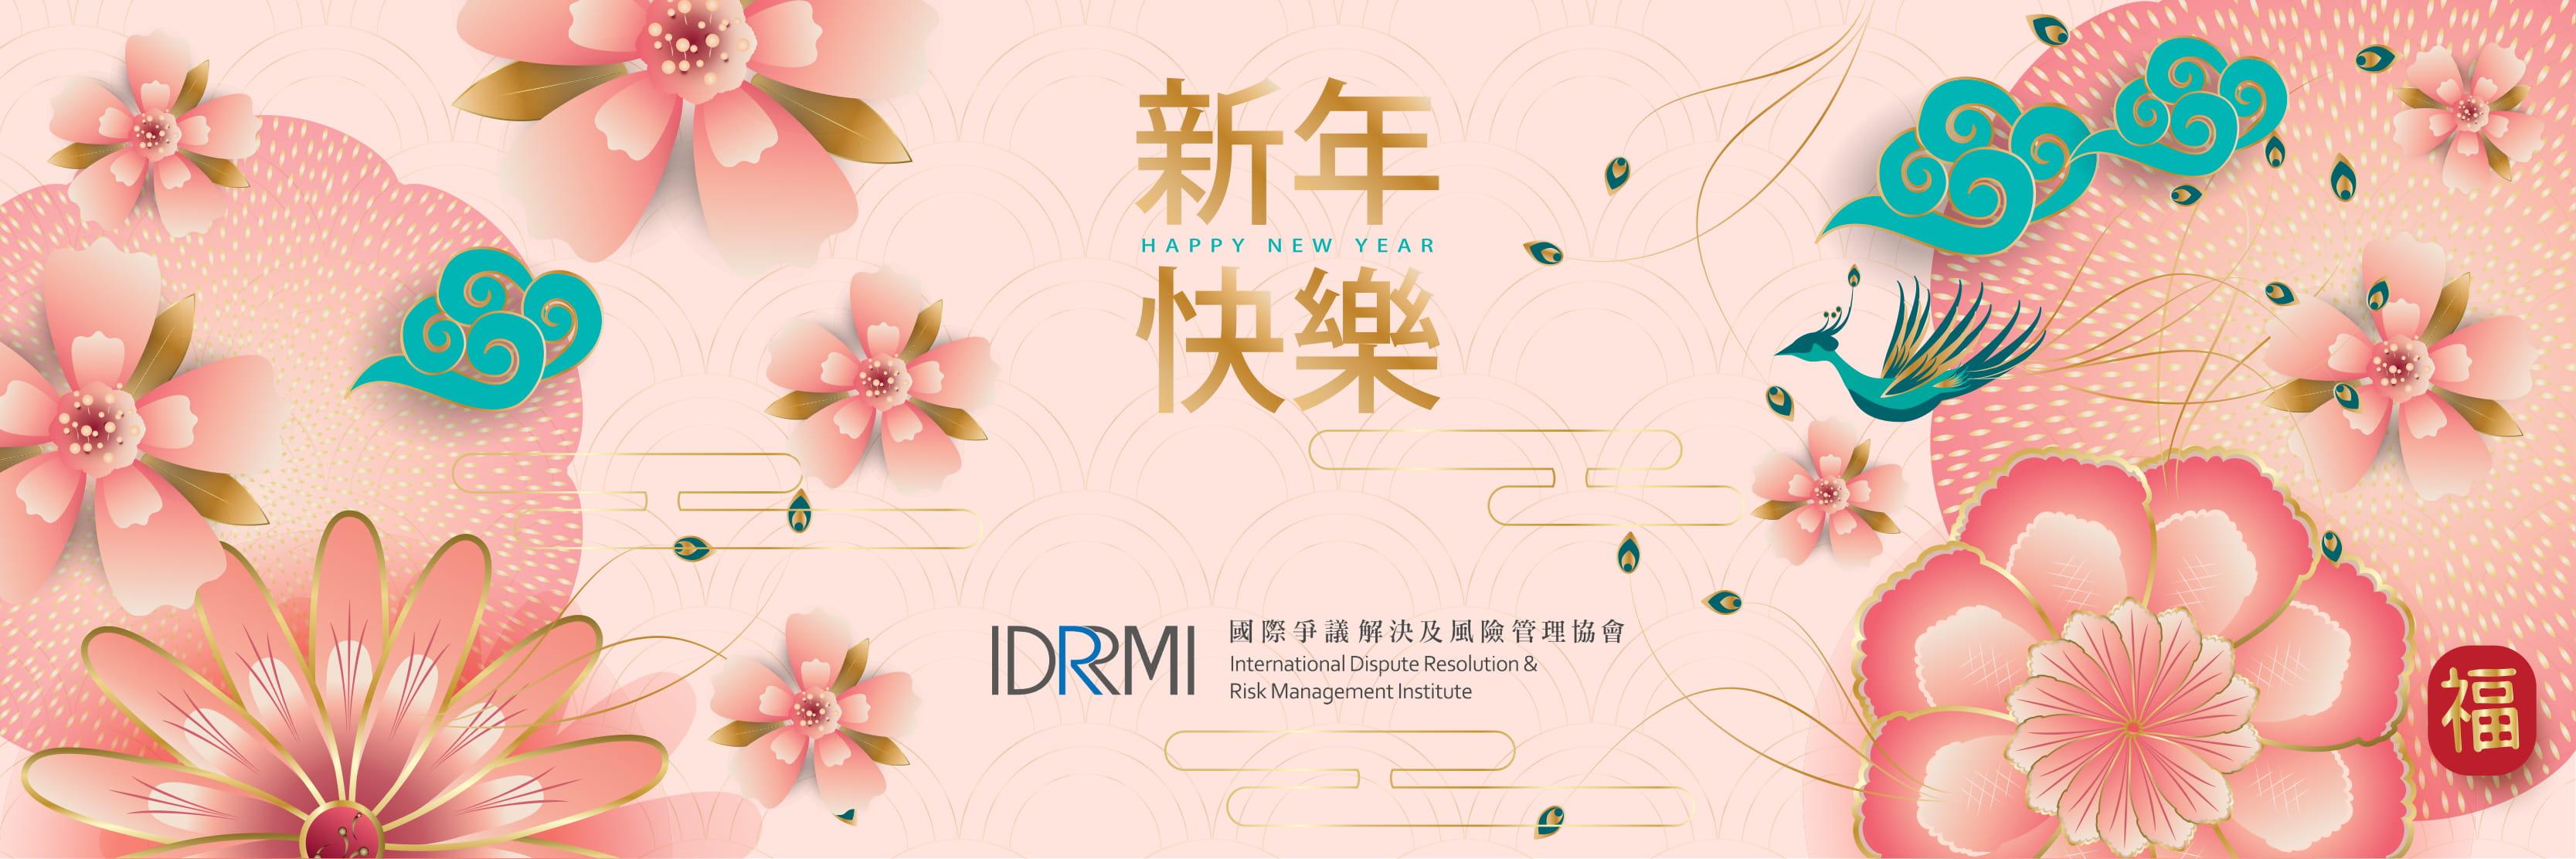 IDRRMI New Year Card-1